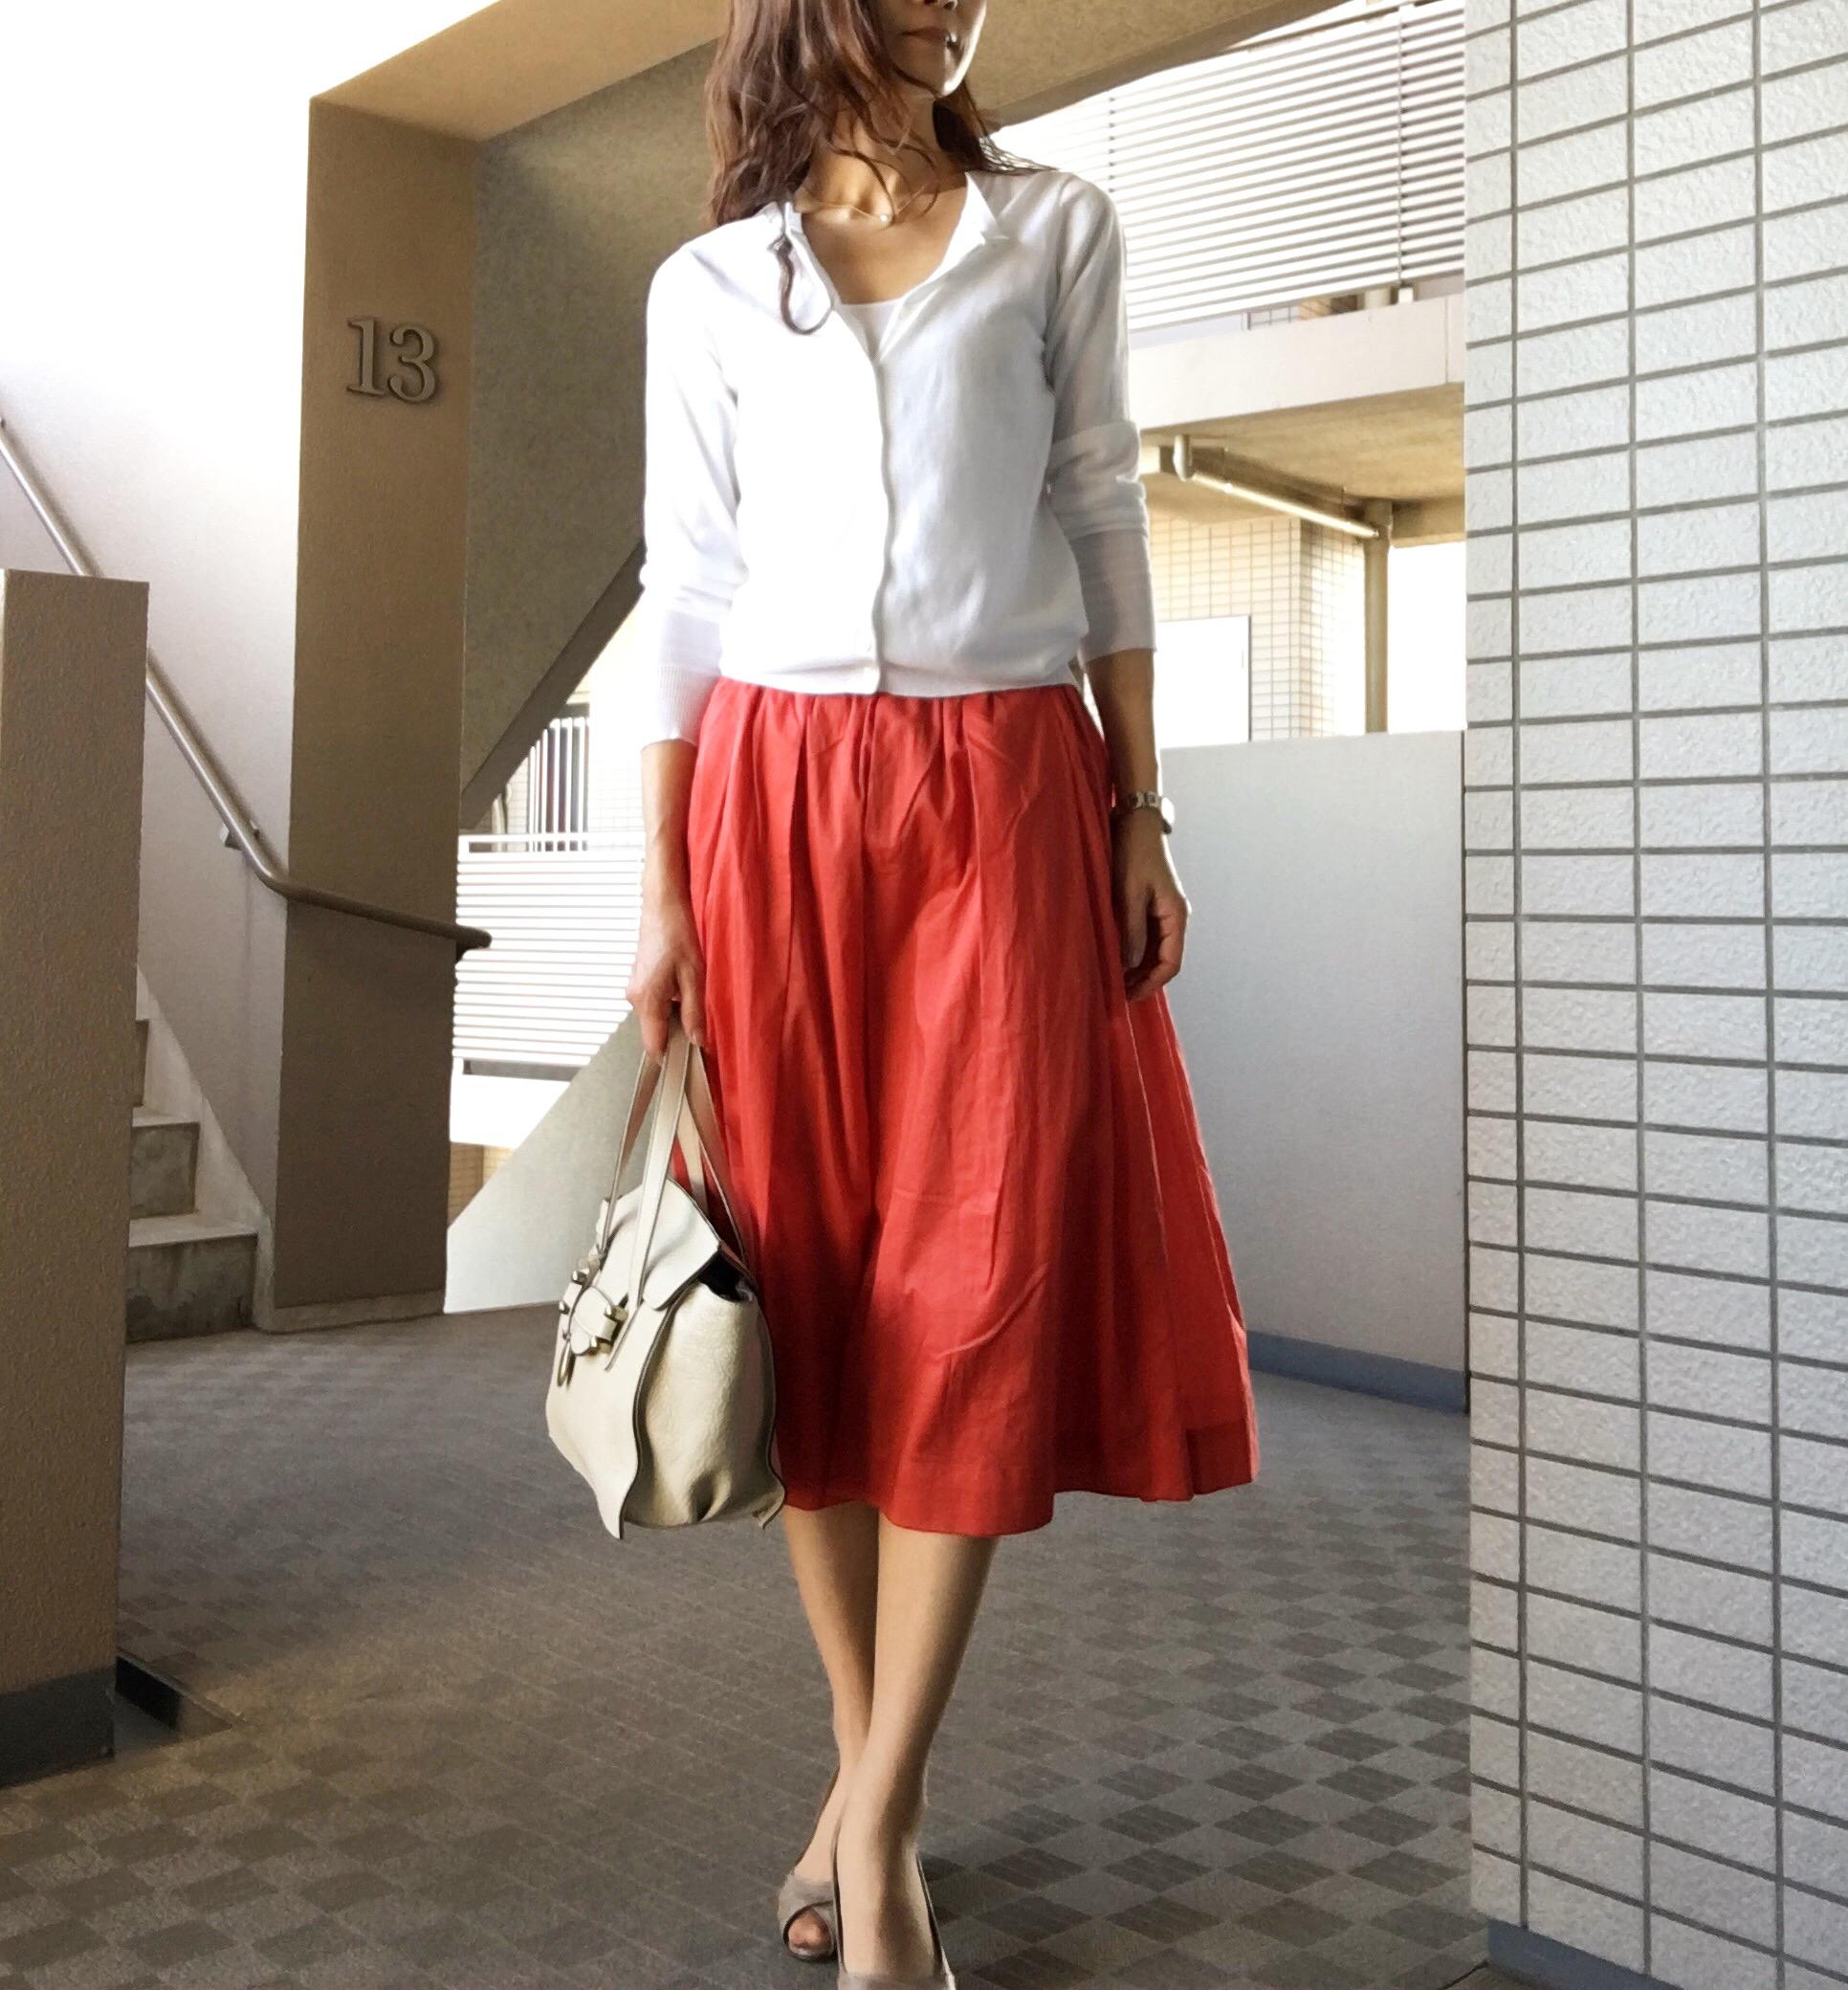 chiyominさんの投稿 - (705989)